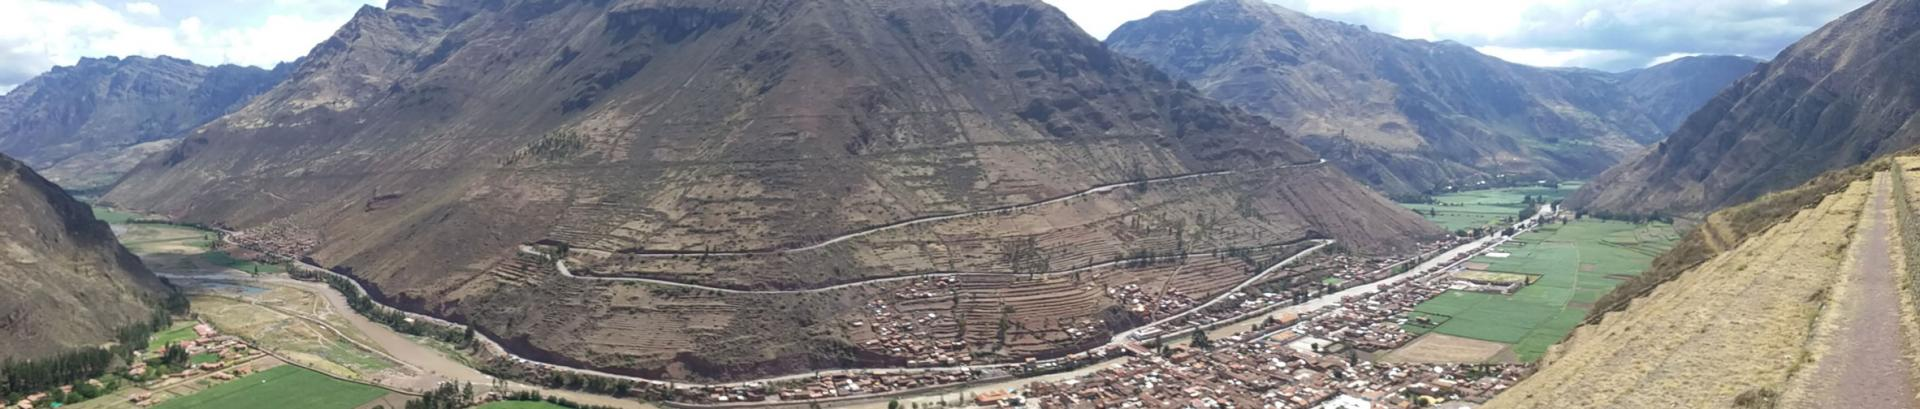 Panorama vallée sacrée